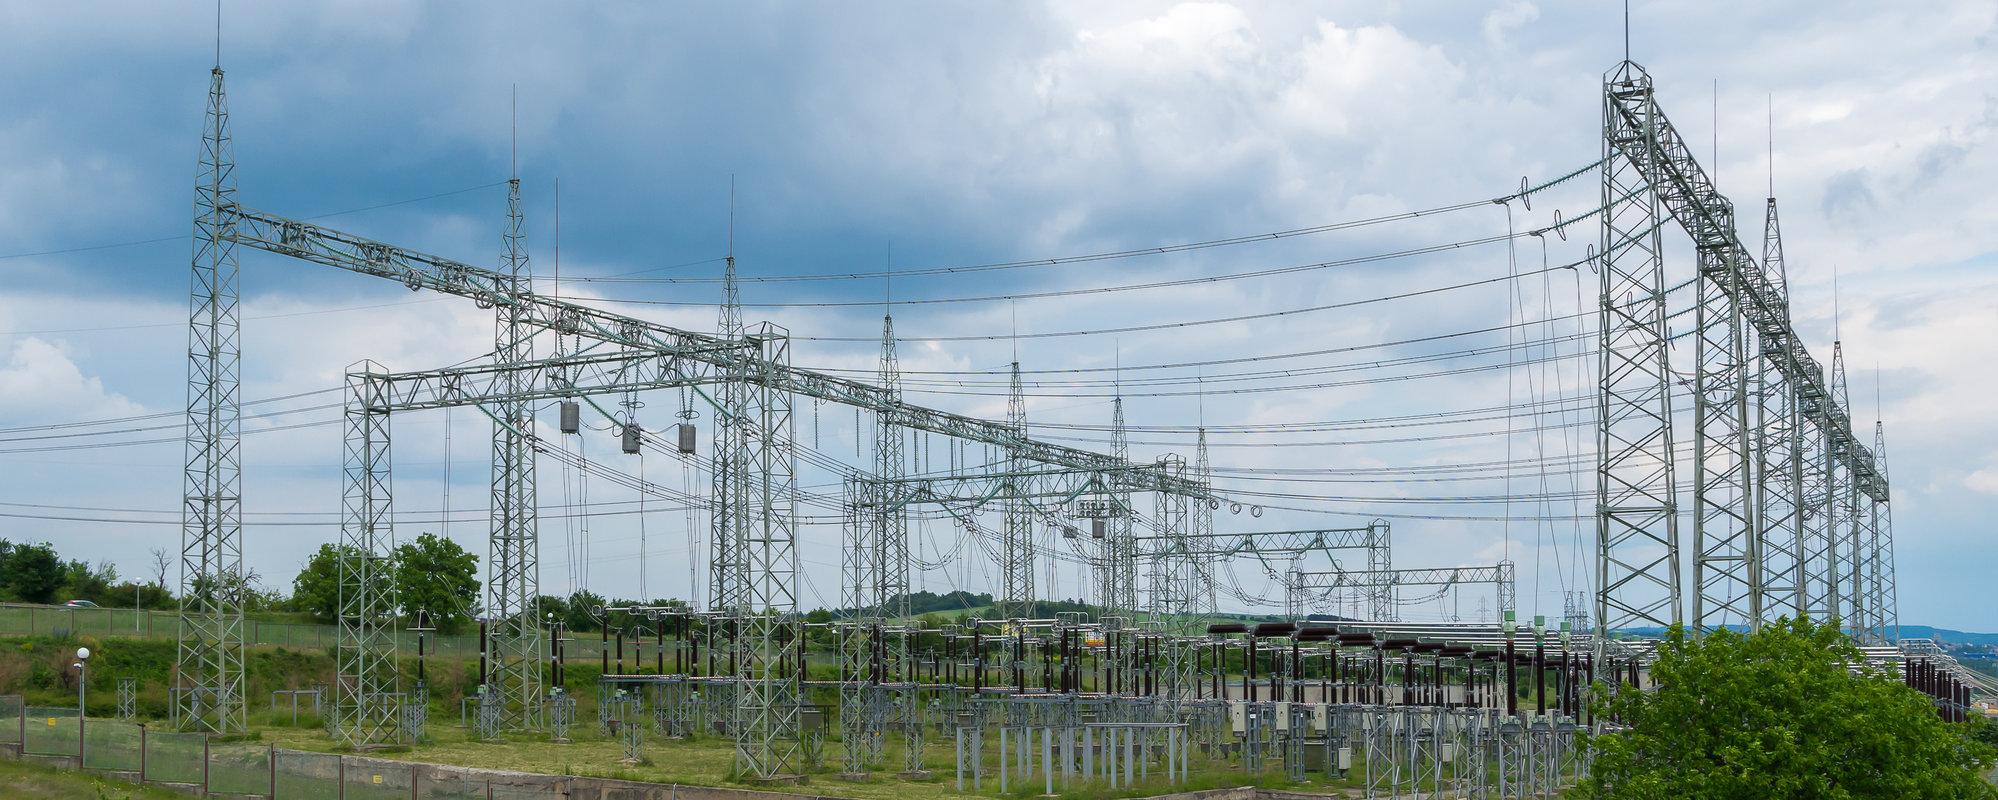 utility-elec